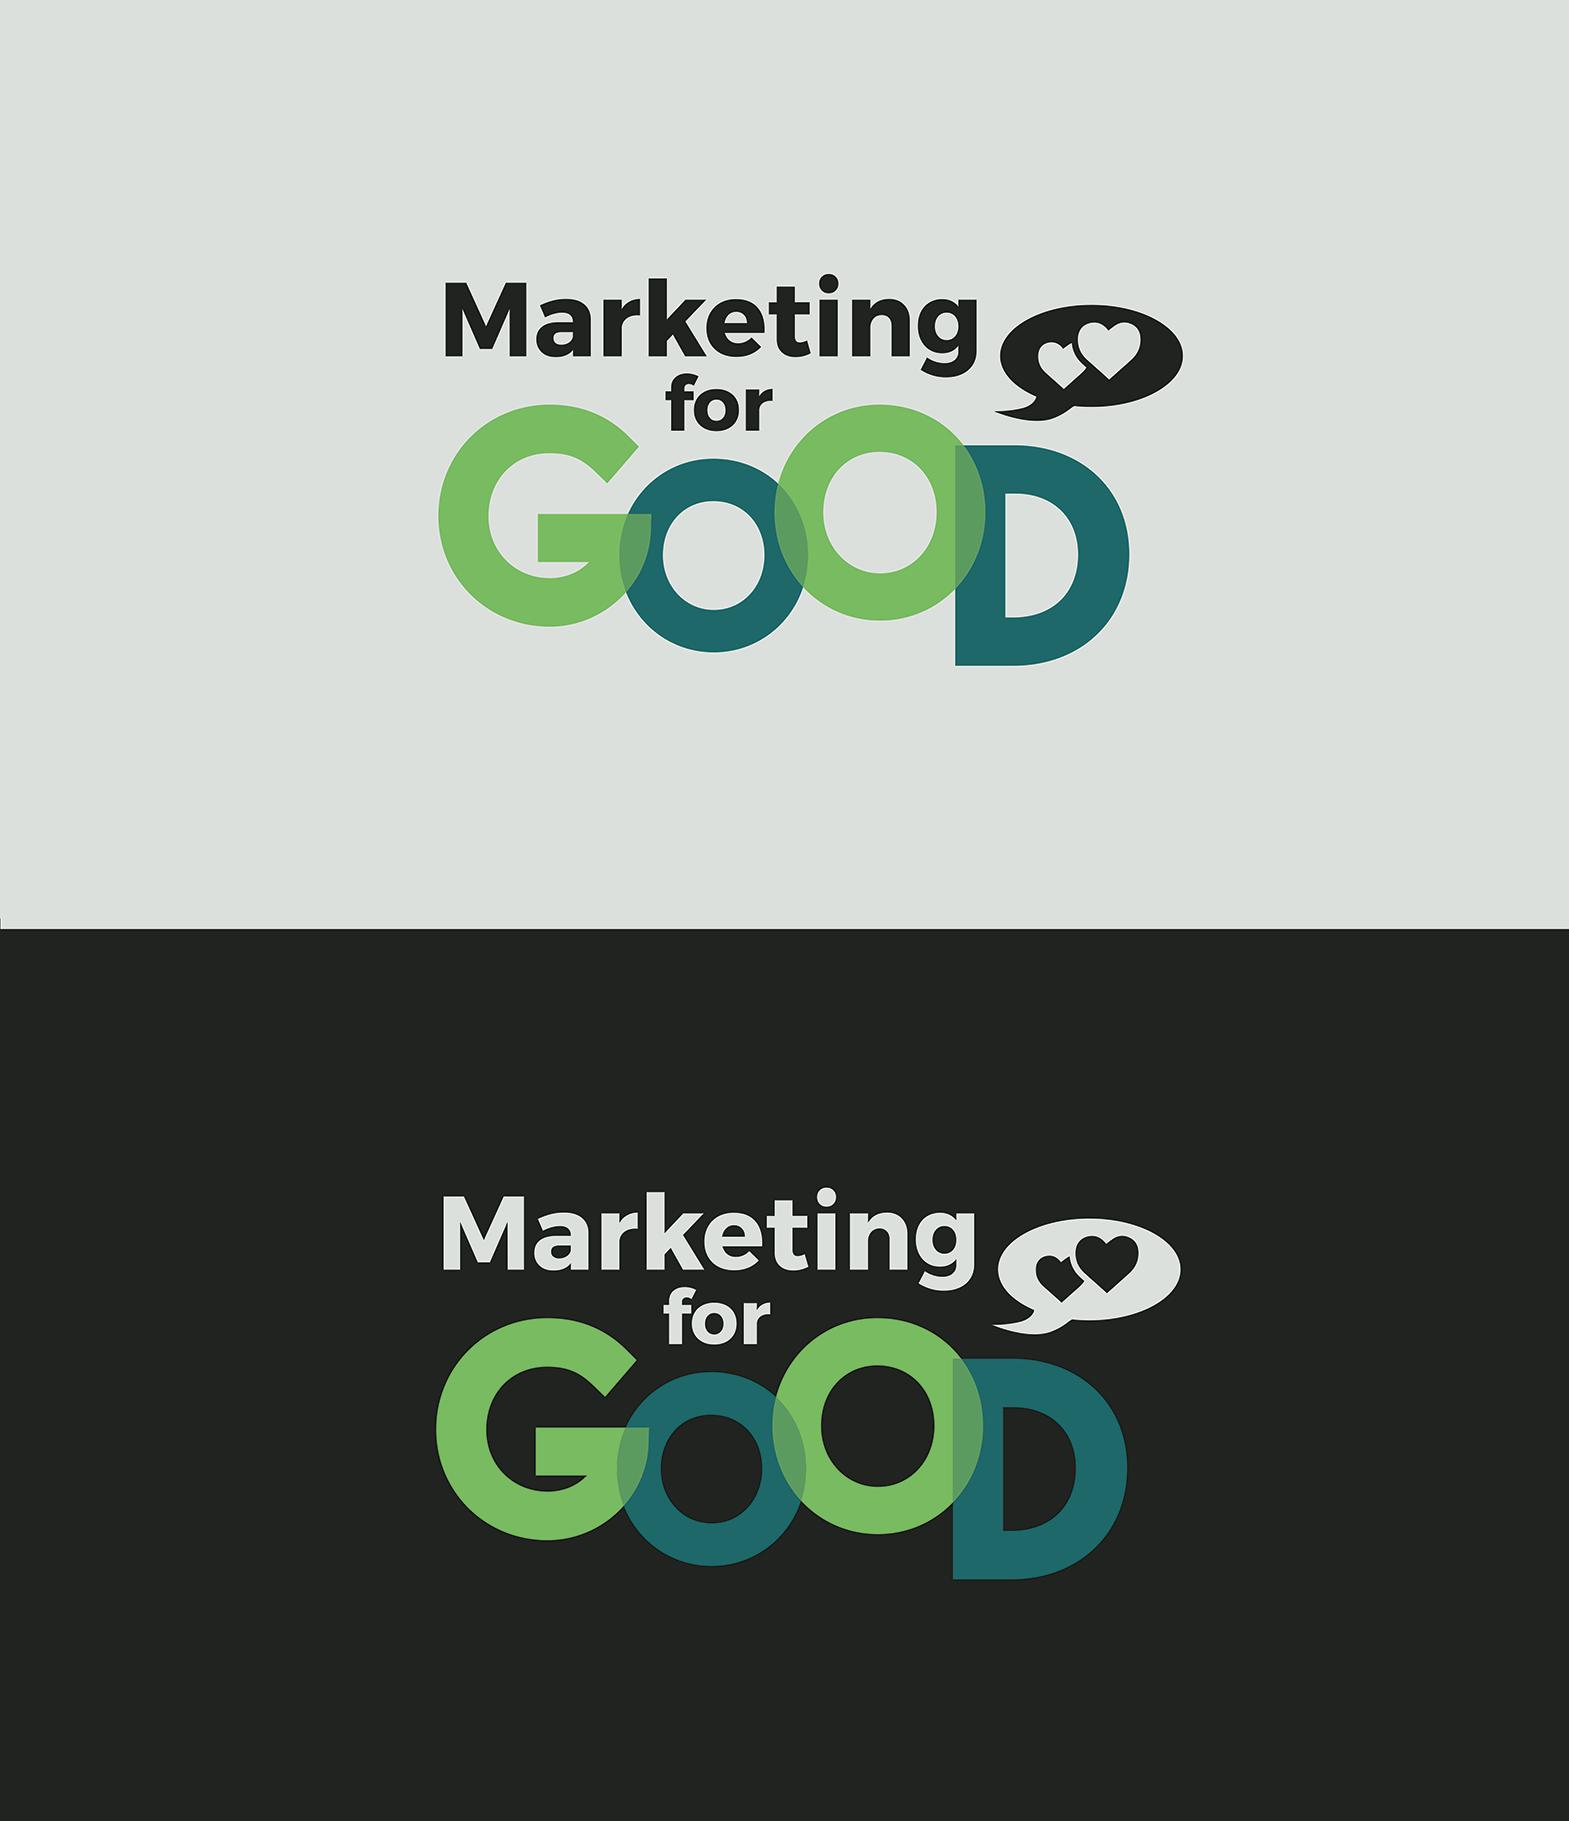 Marketing for Good Branding.png